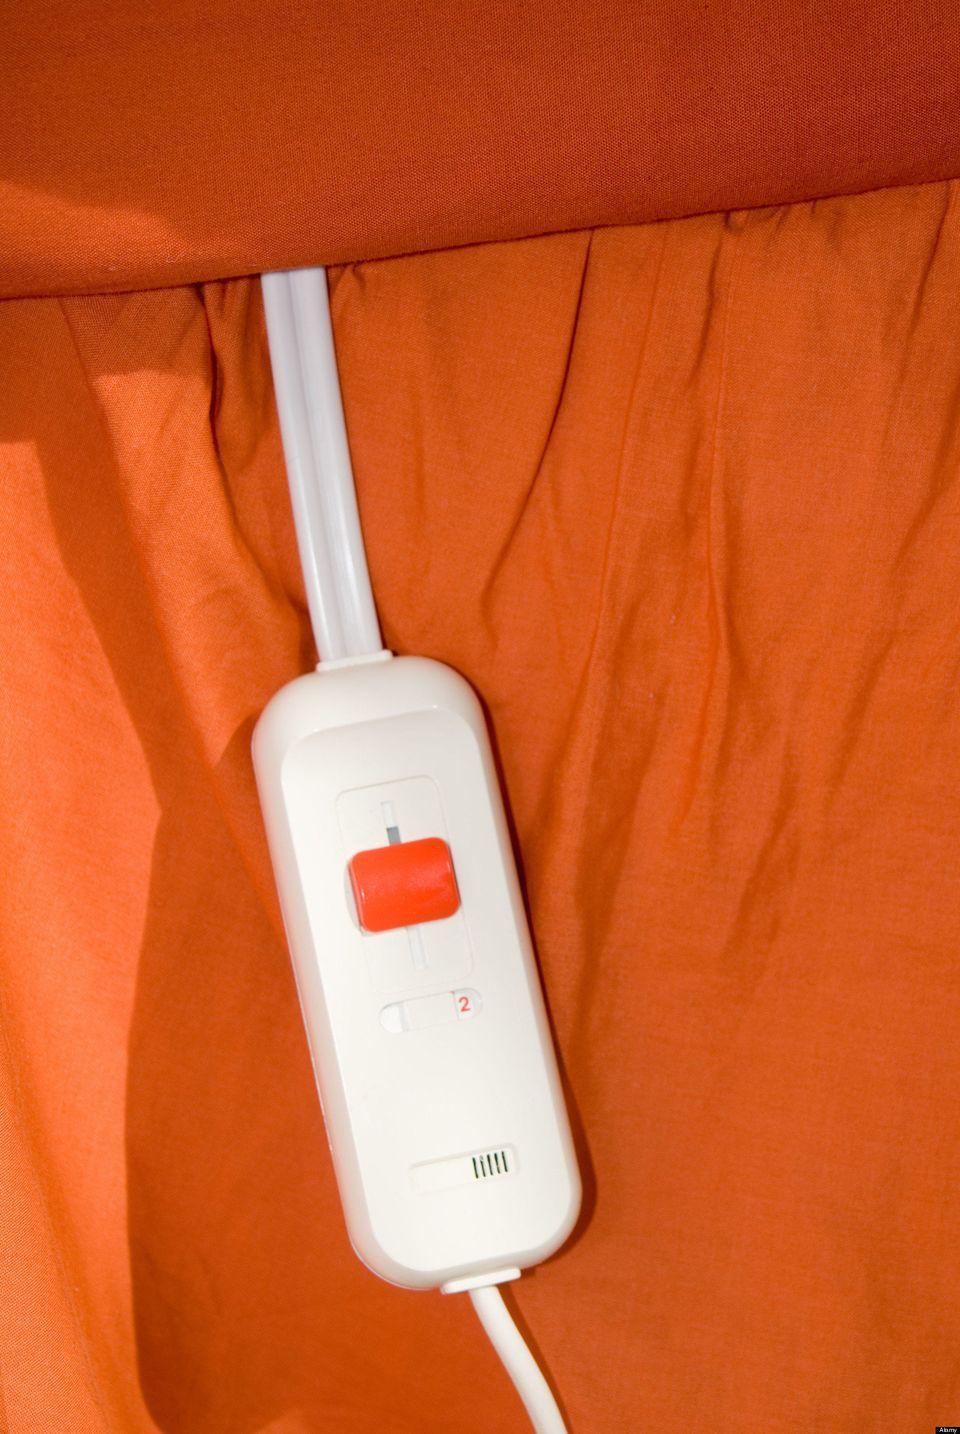 """An electric blanket - summed up relationship nicely #TookTheHint"" <em>-@dottytee</em>"